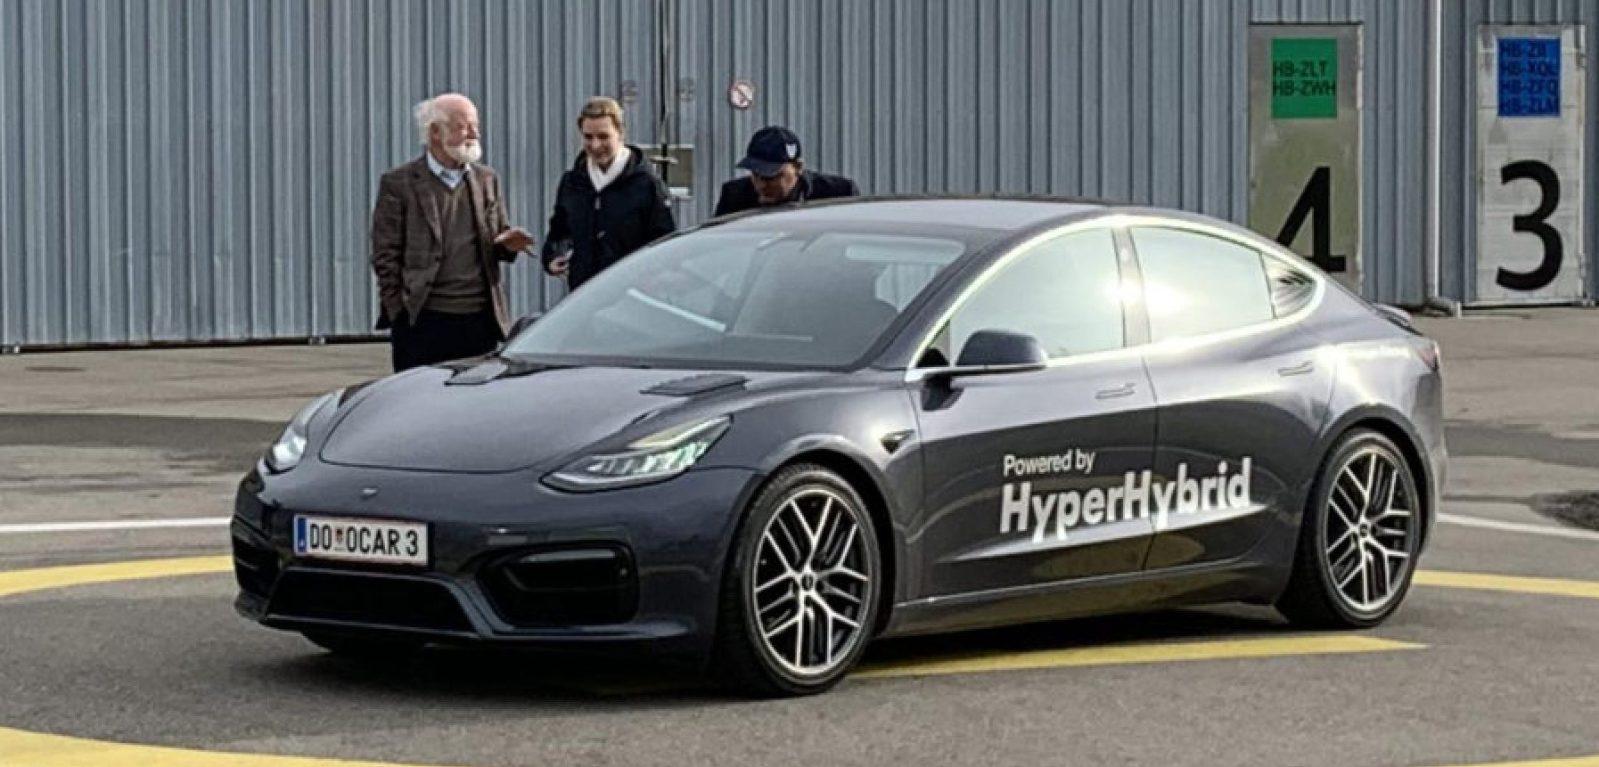 Tesla Model 3 gets a gas engine hybrid conversion – creating the worst Tesla ever